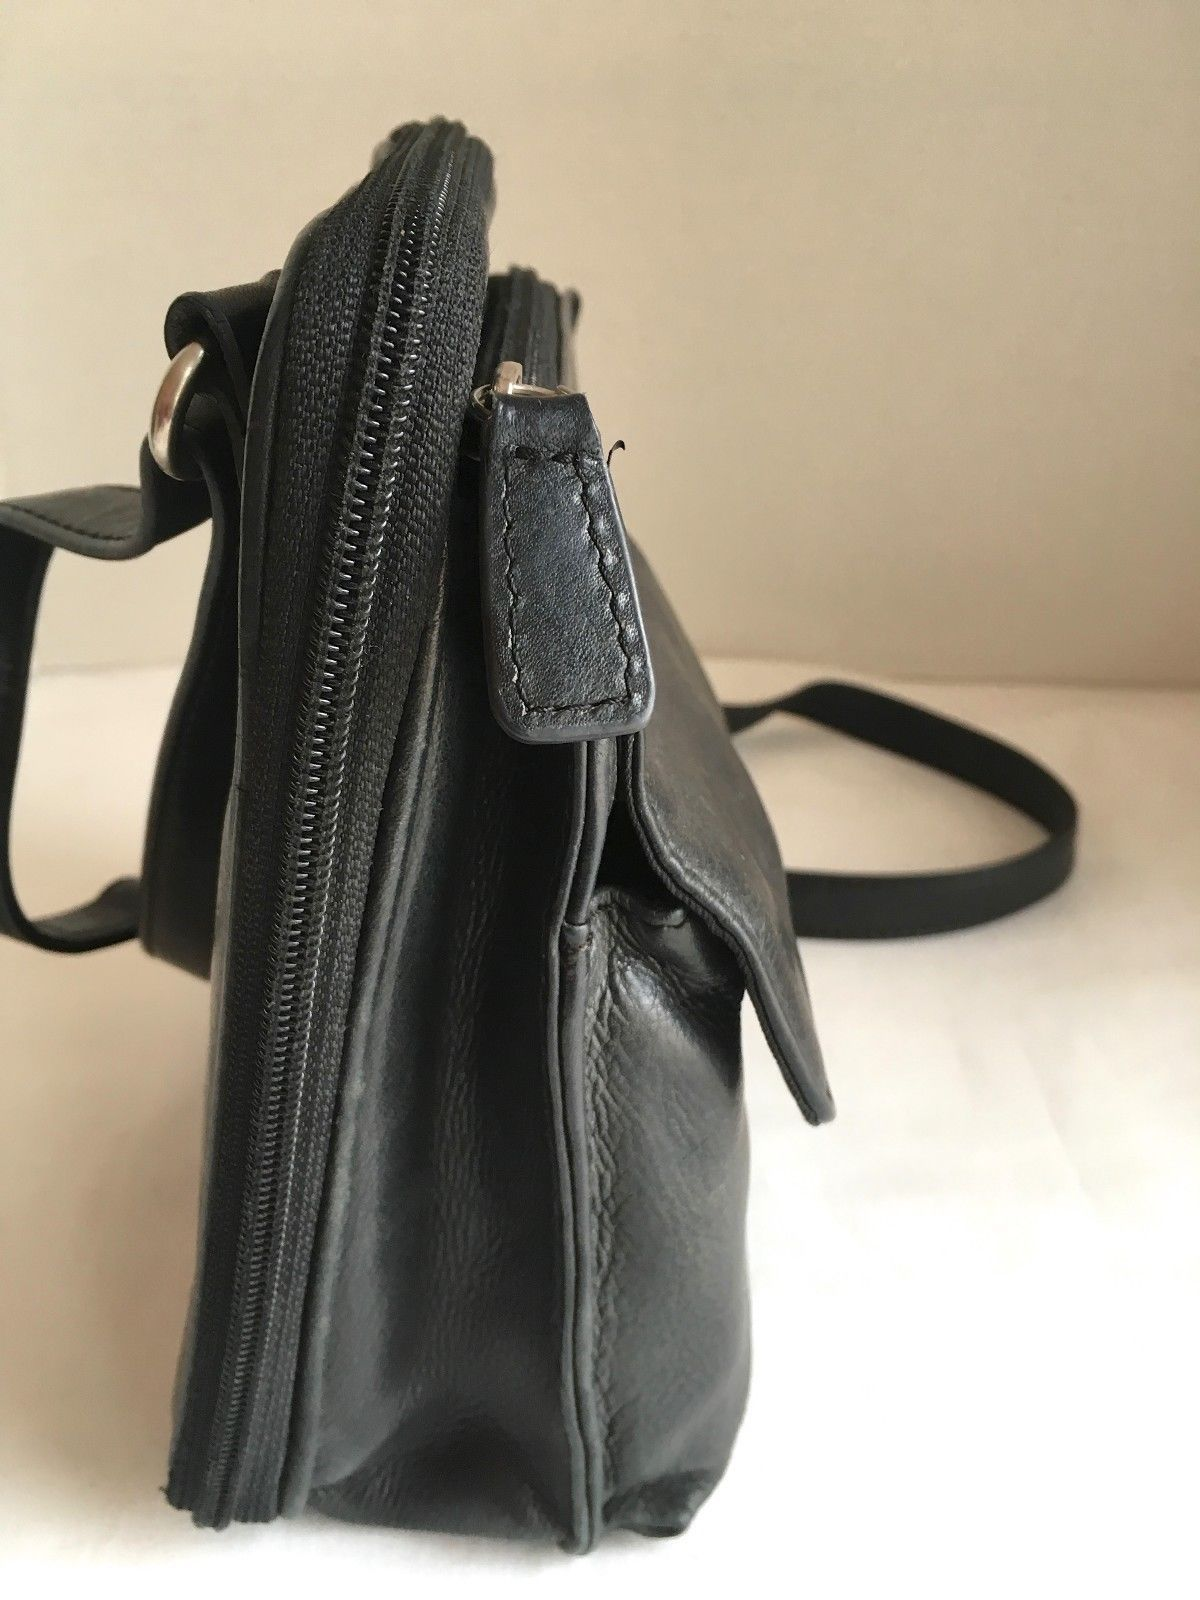 b594a2bf2bbf Fossil SL8751 Vintage Black Leather Cargo Organizer Cross-Body Bag MANY  Pockets